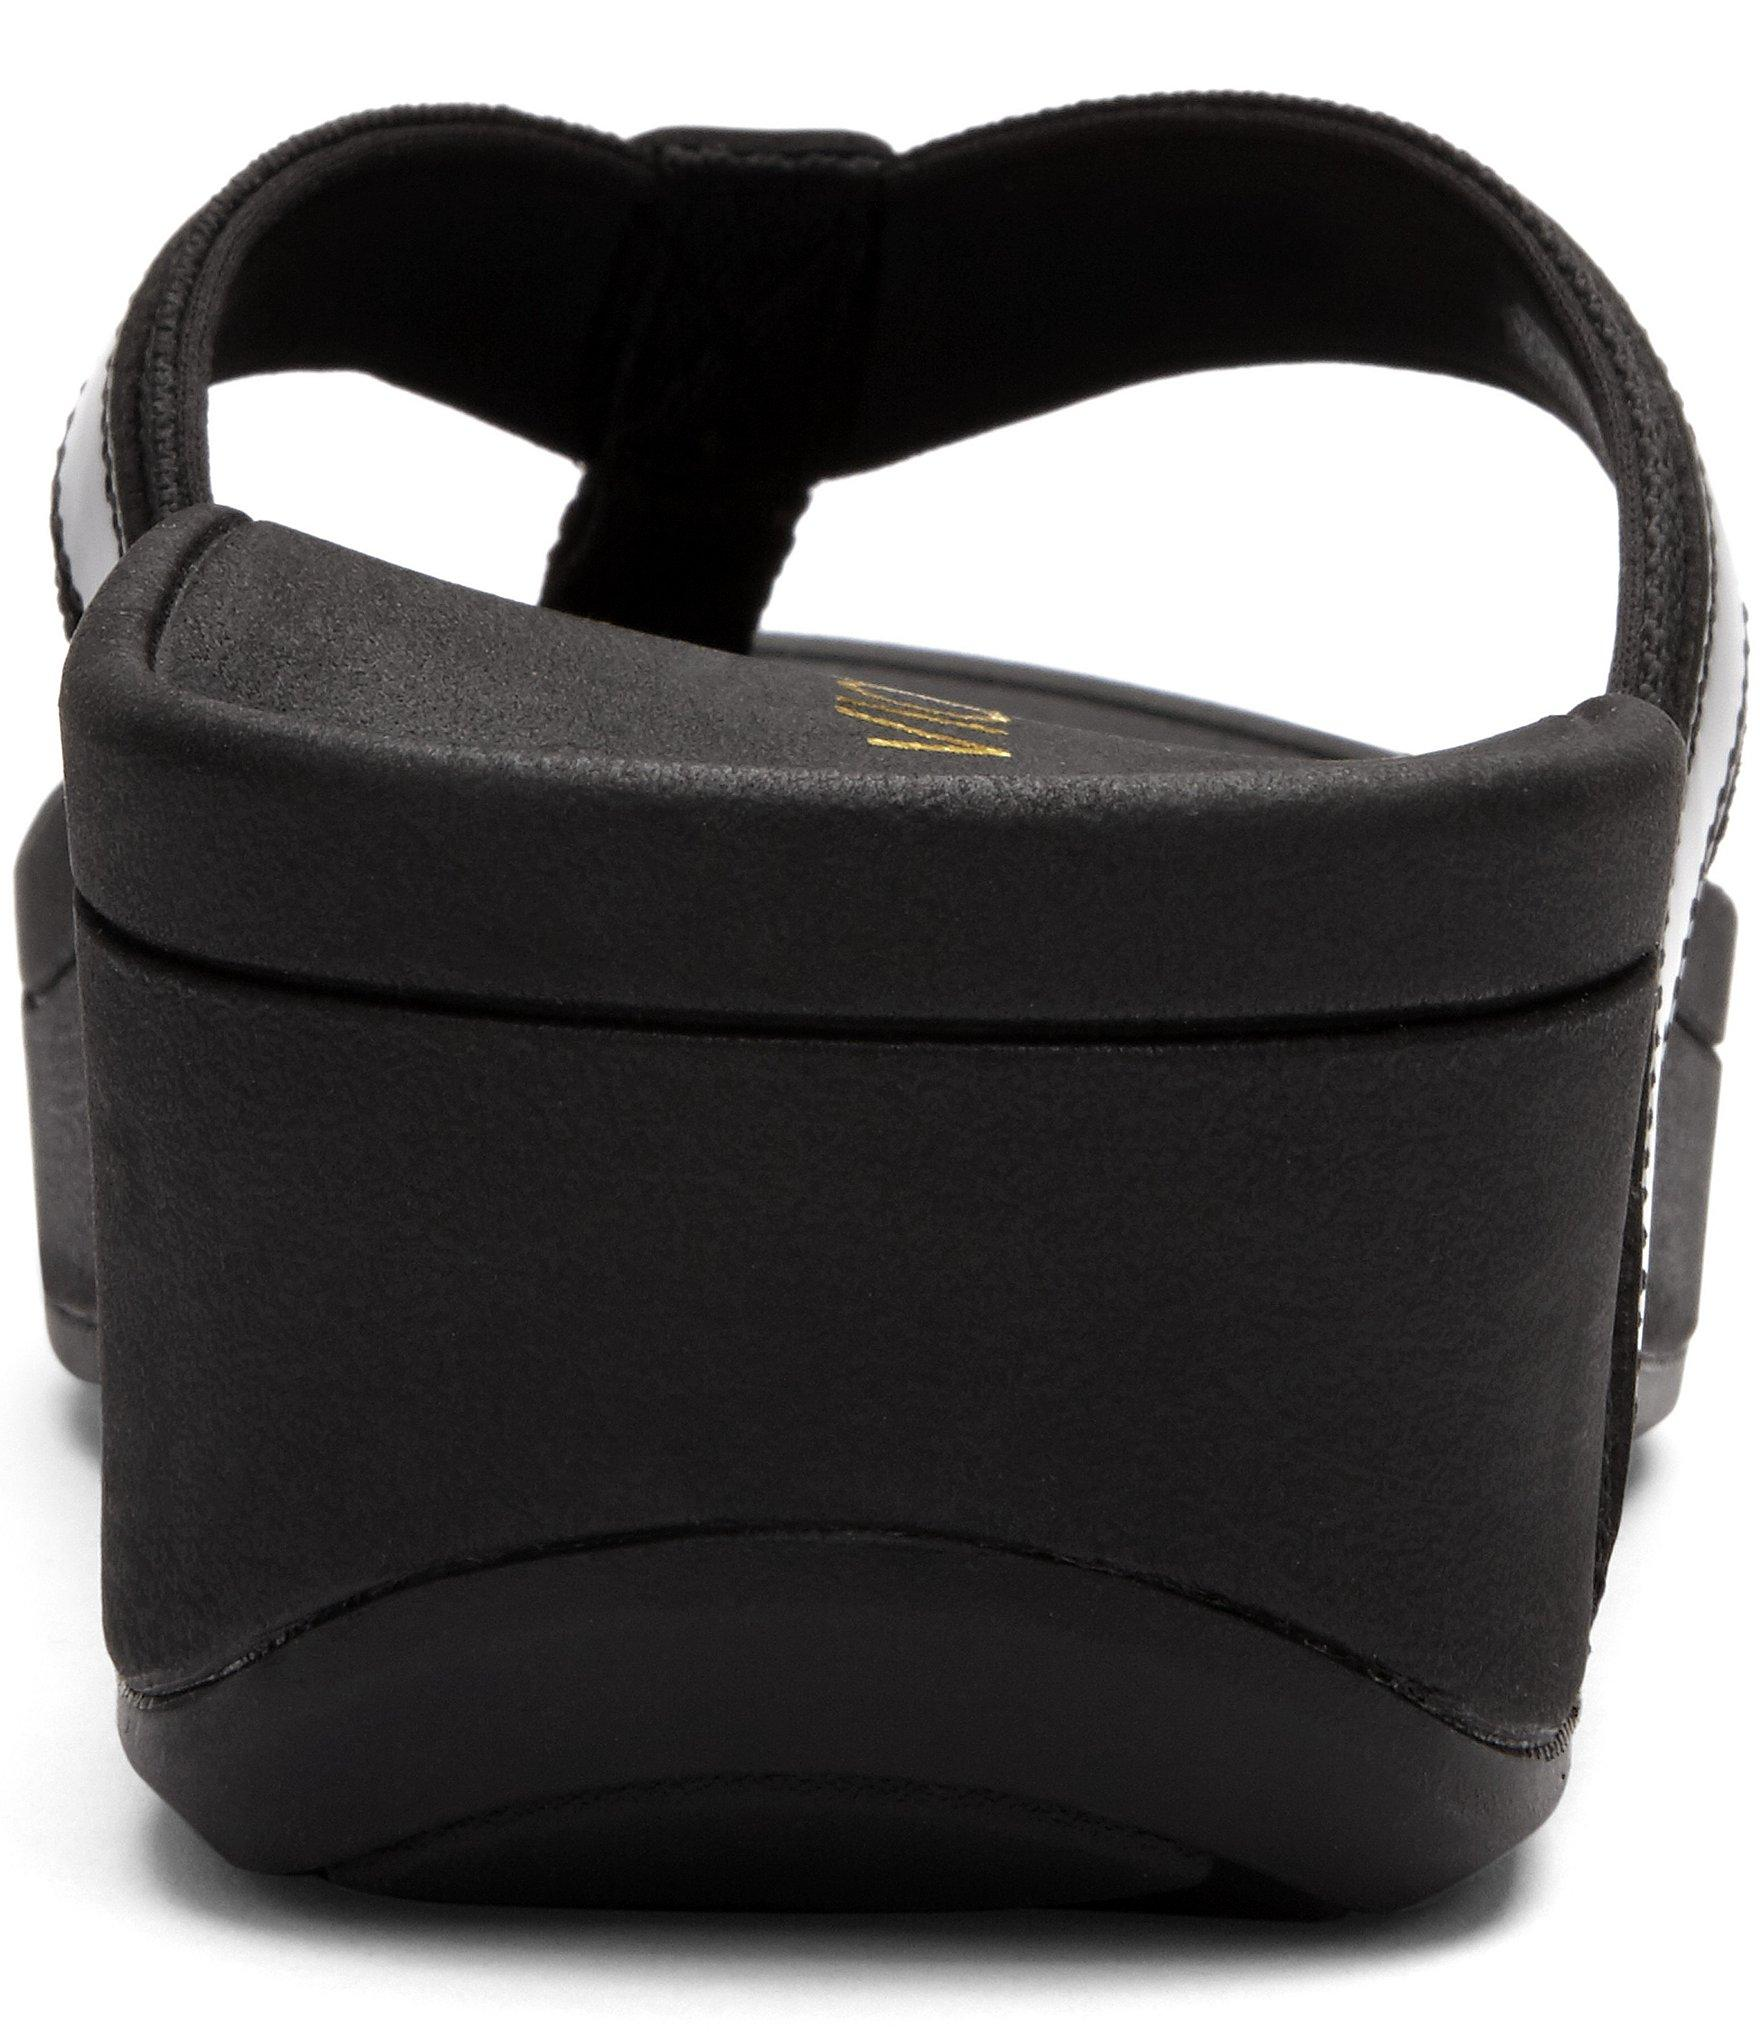 Vionic High Tide Leather  Textile Flip-Flops In Black - Lyst-3755